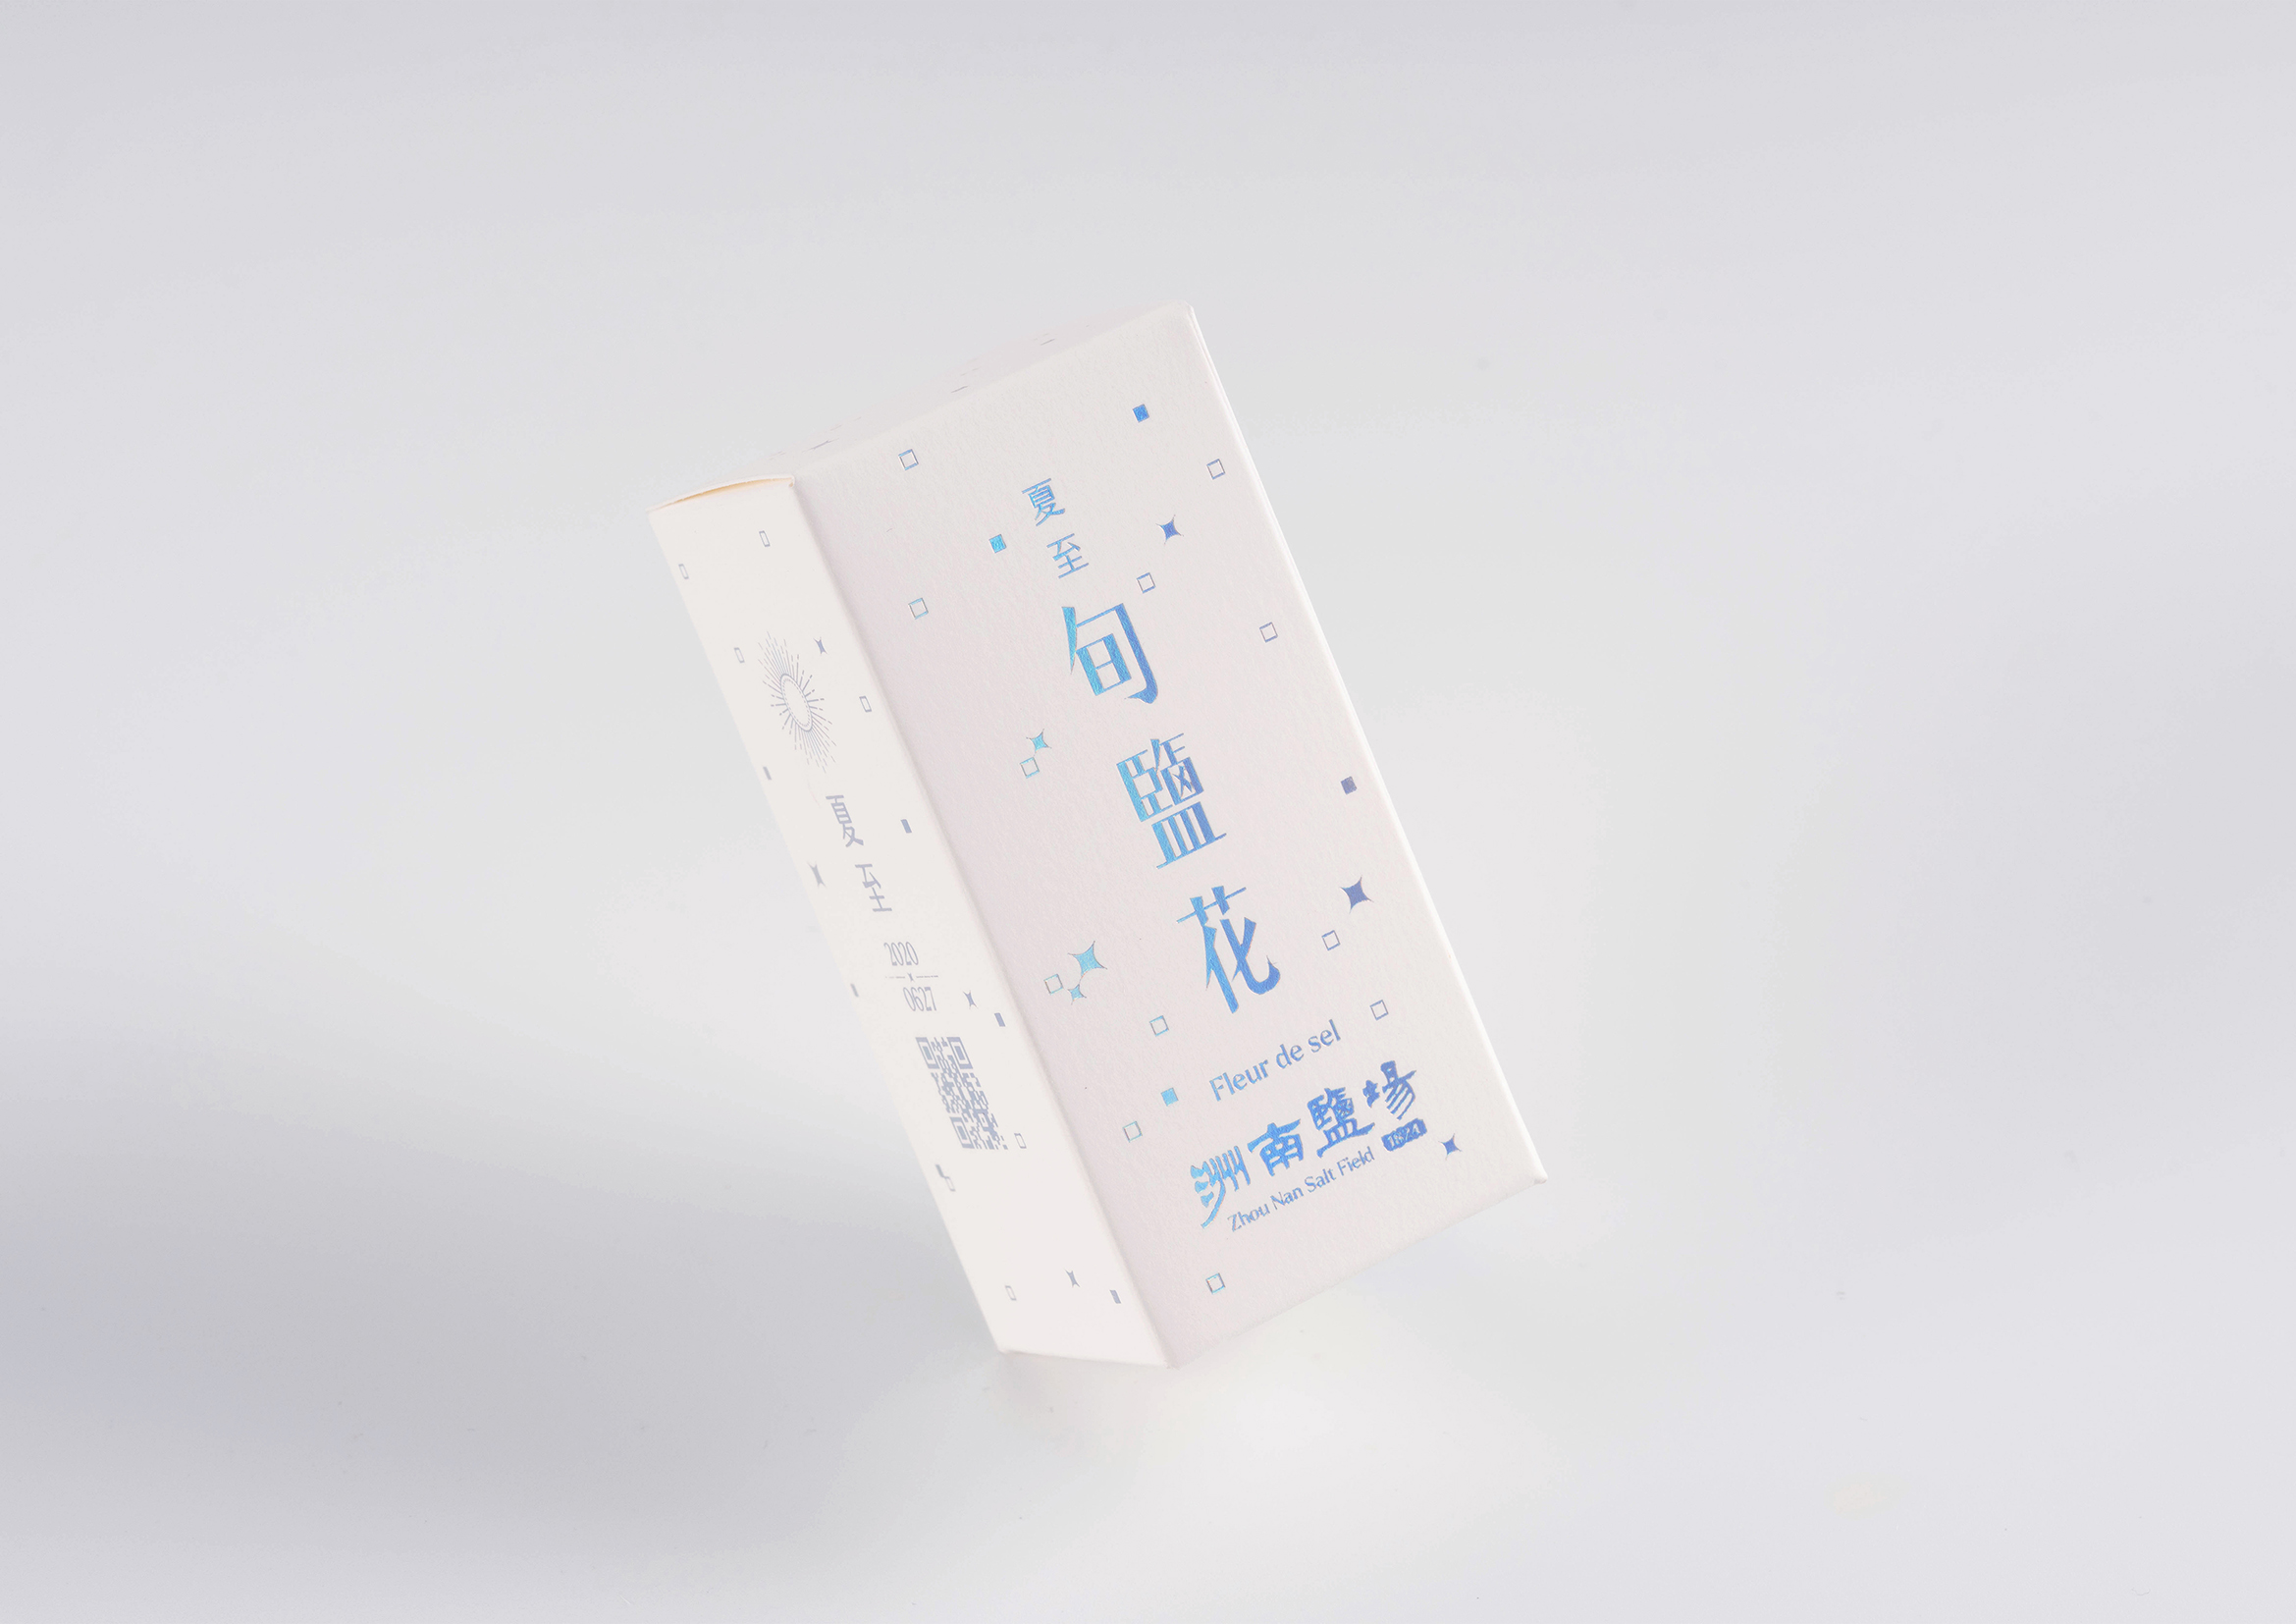 洲南鹽場 旬鹽花 Fleur De Sel of the 24 solar terms 1